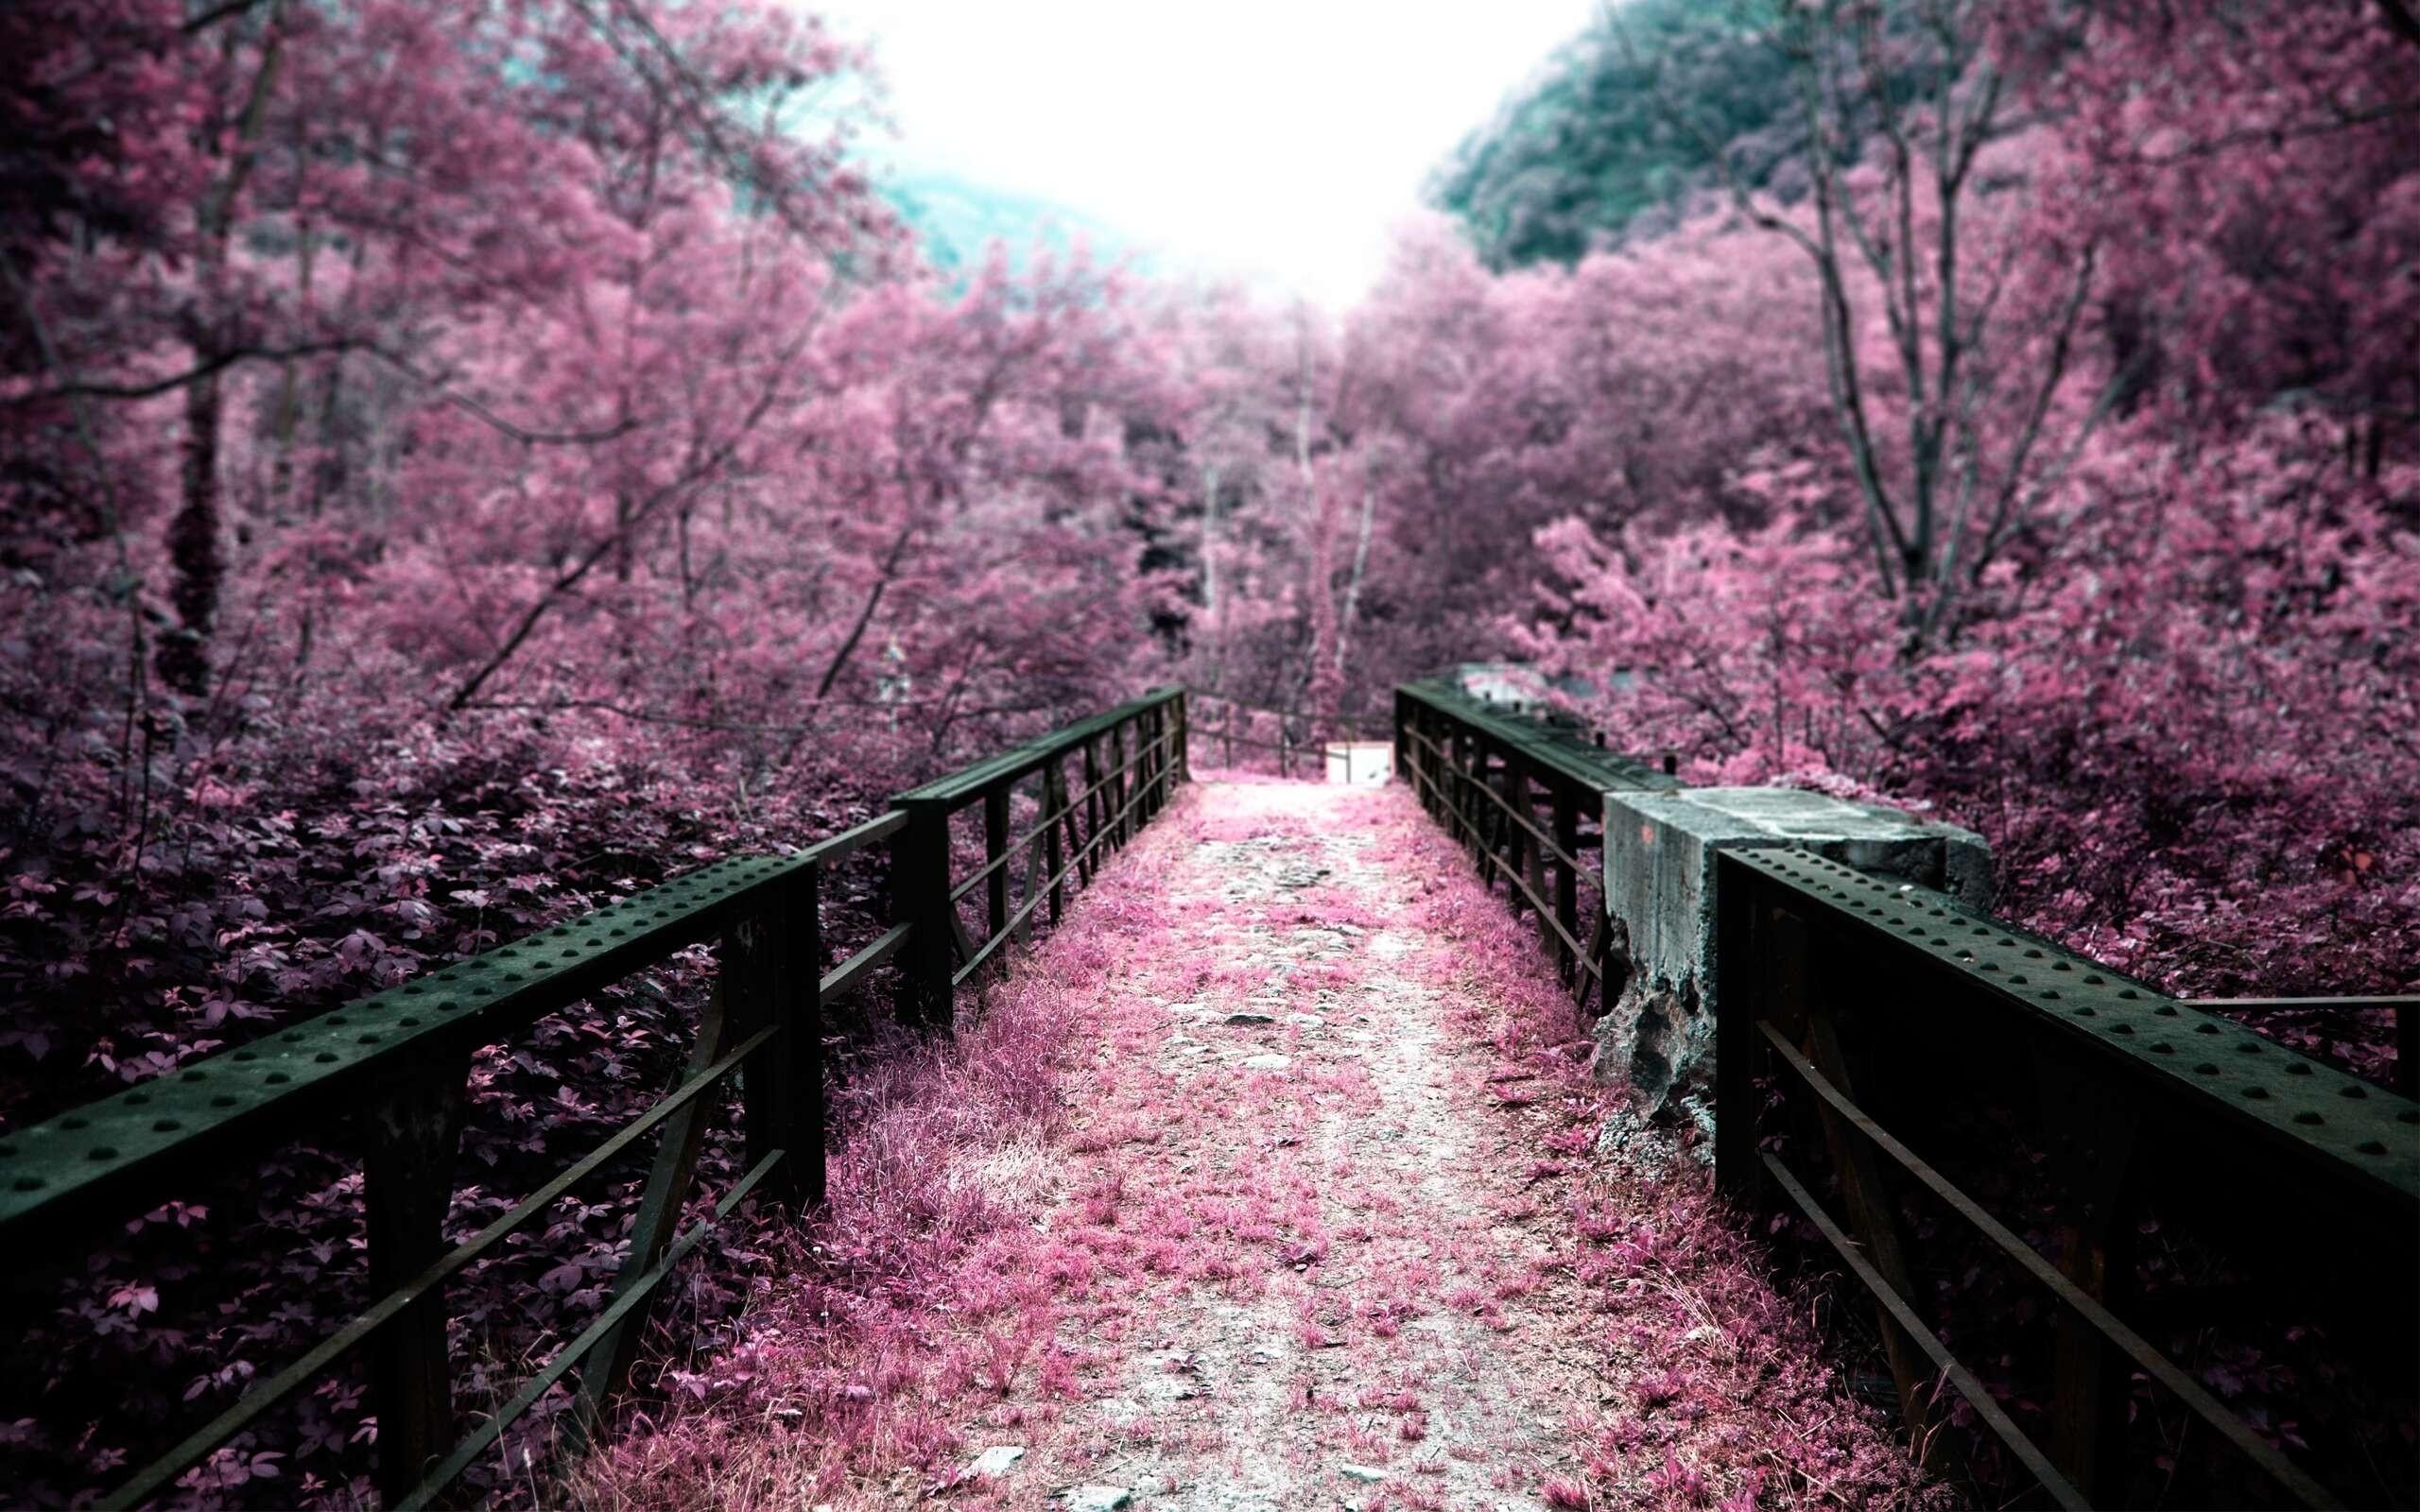 Wallpaper Cabang Jembatan Bunga Sakura Mekar Musim Semi